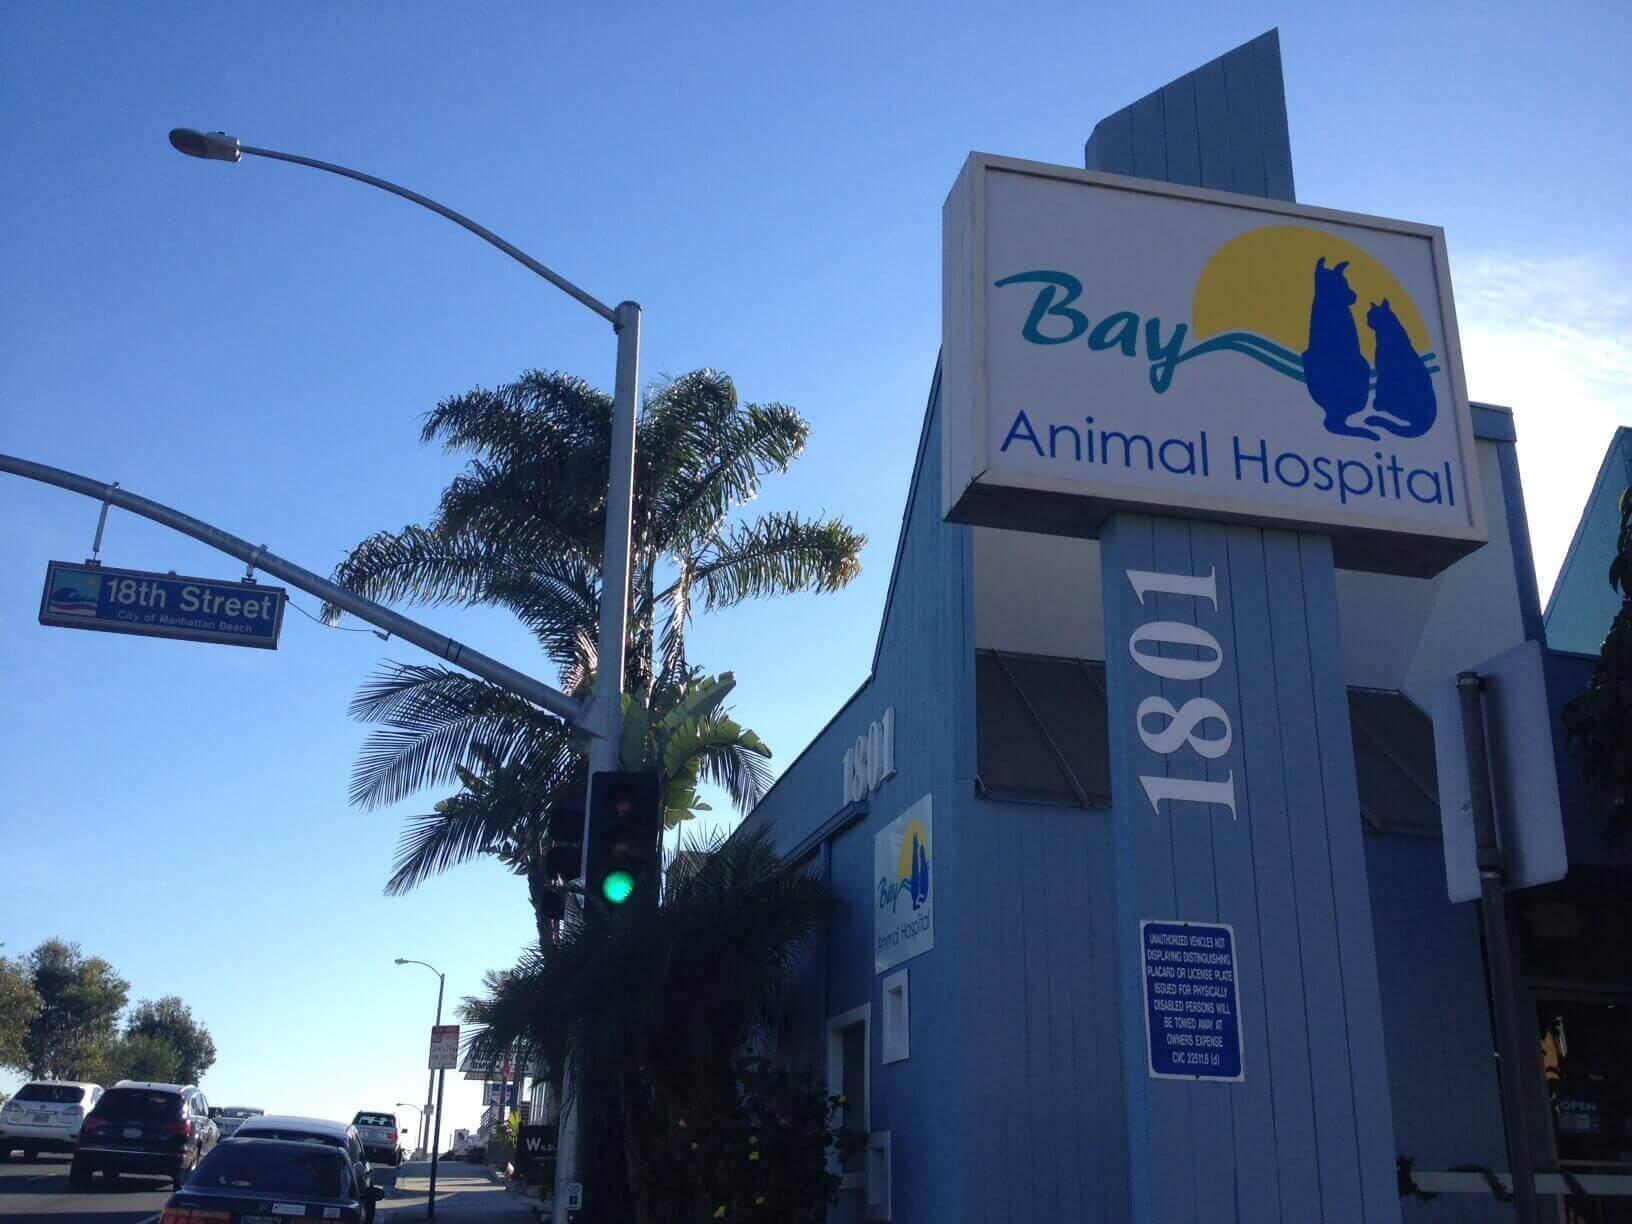 Bay Animal Hospital